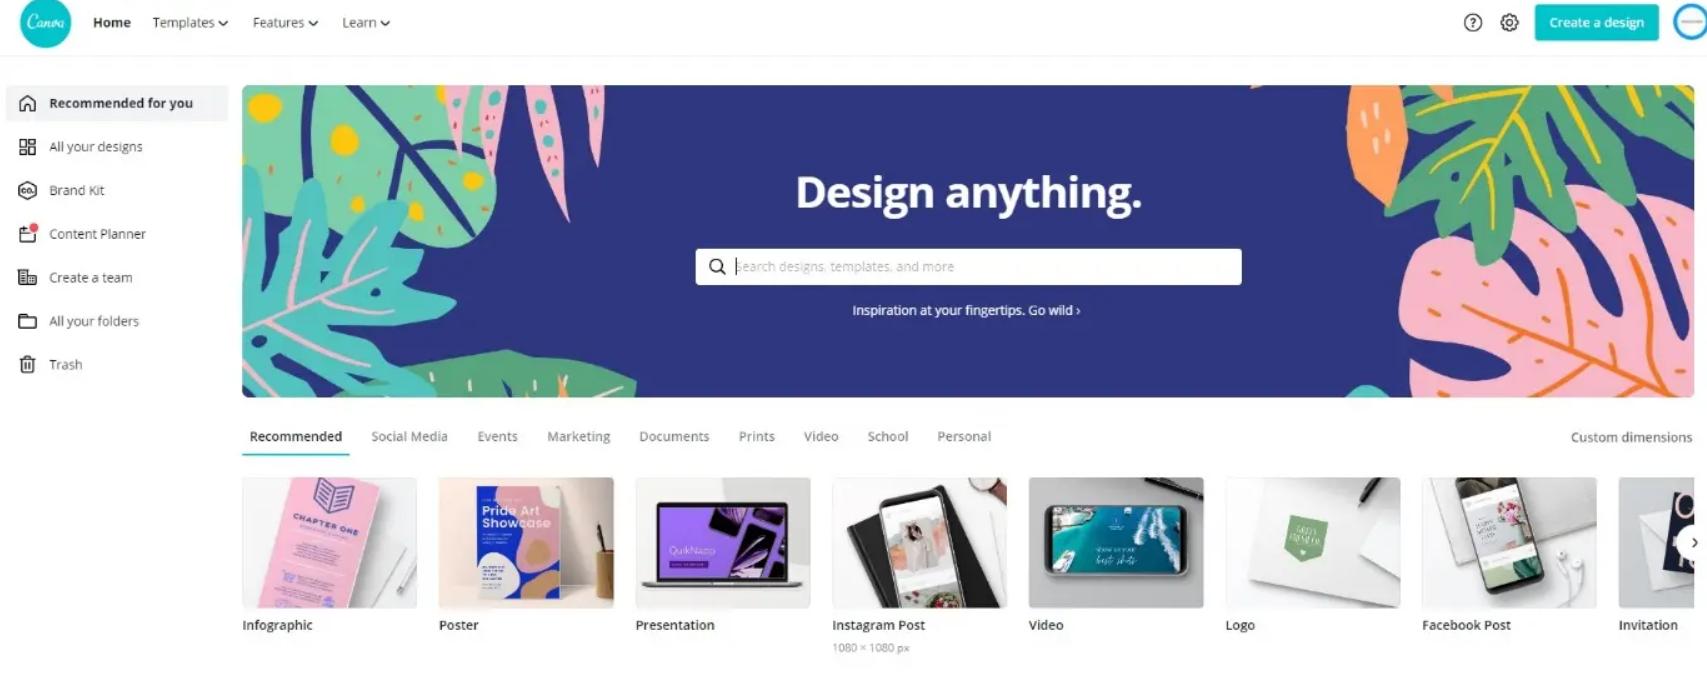 instagram design software